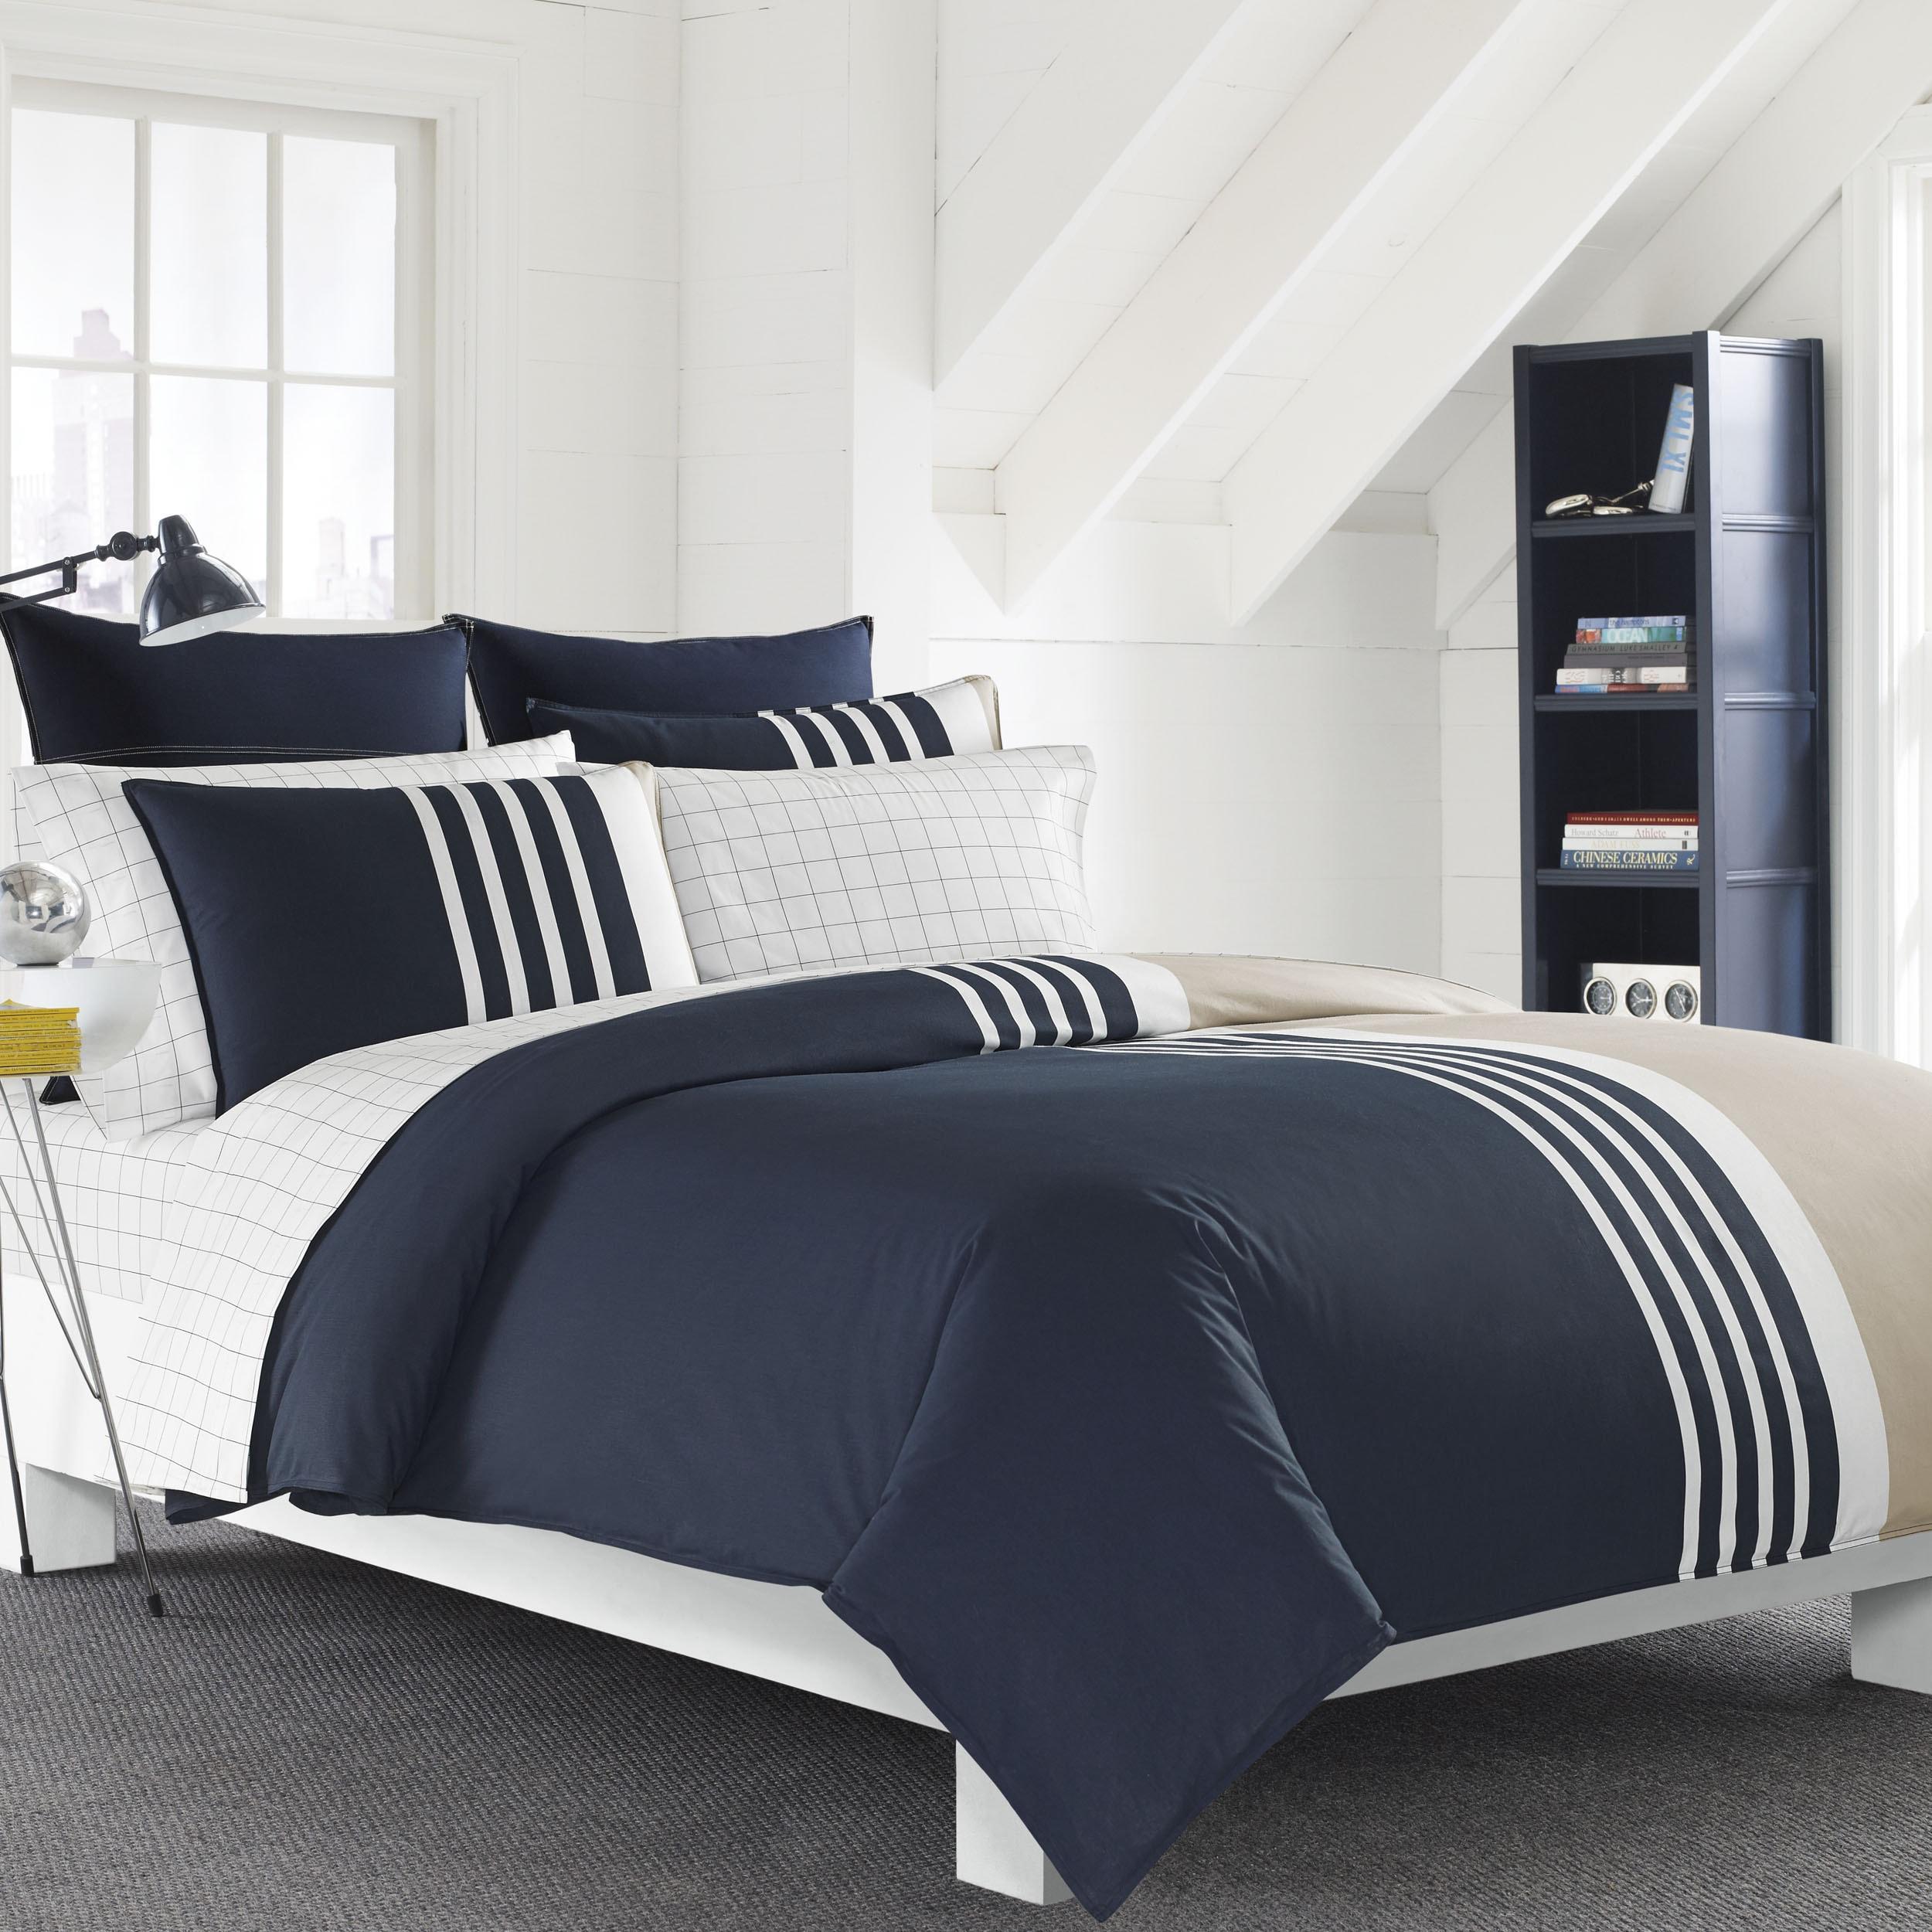 bed set overstock on product white free comforter decor piece venetian bath bedding lush shipping com